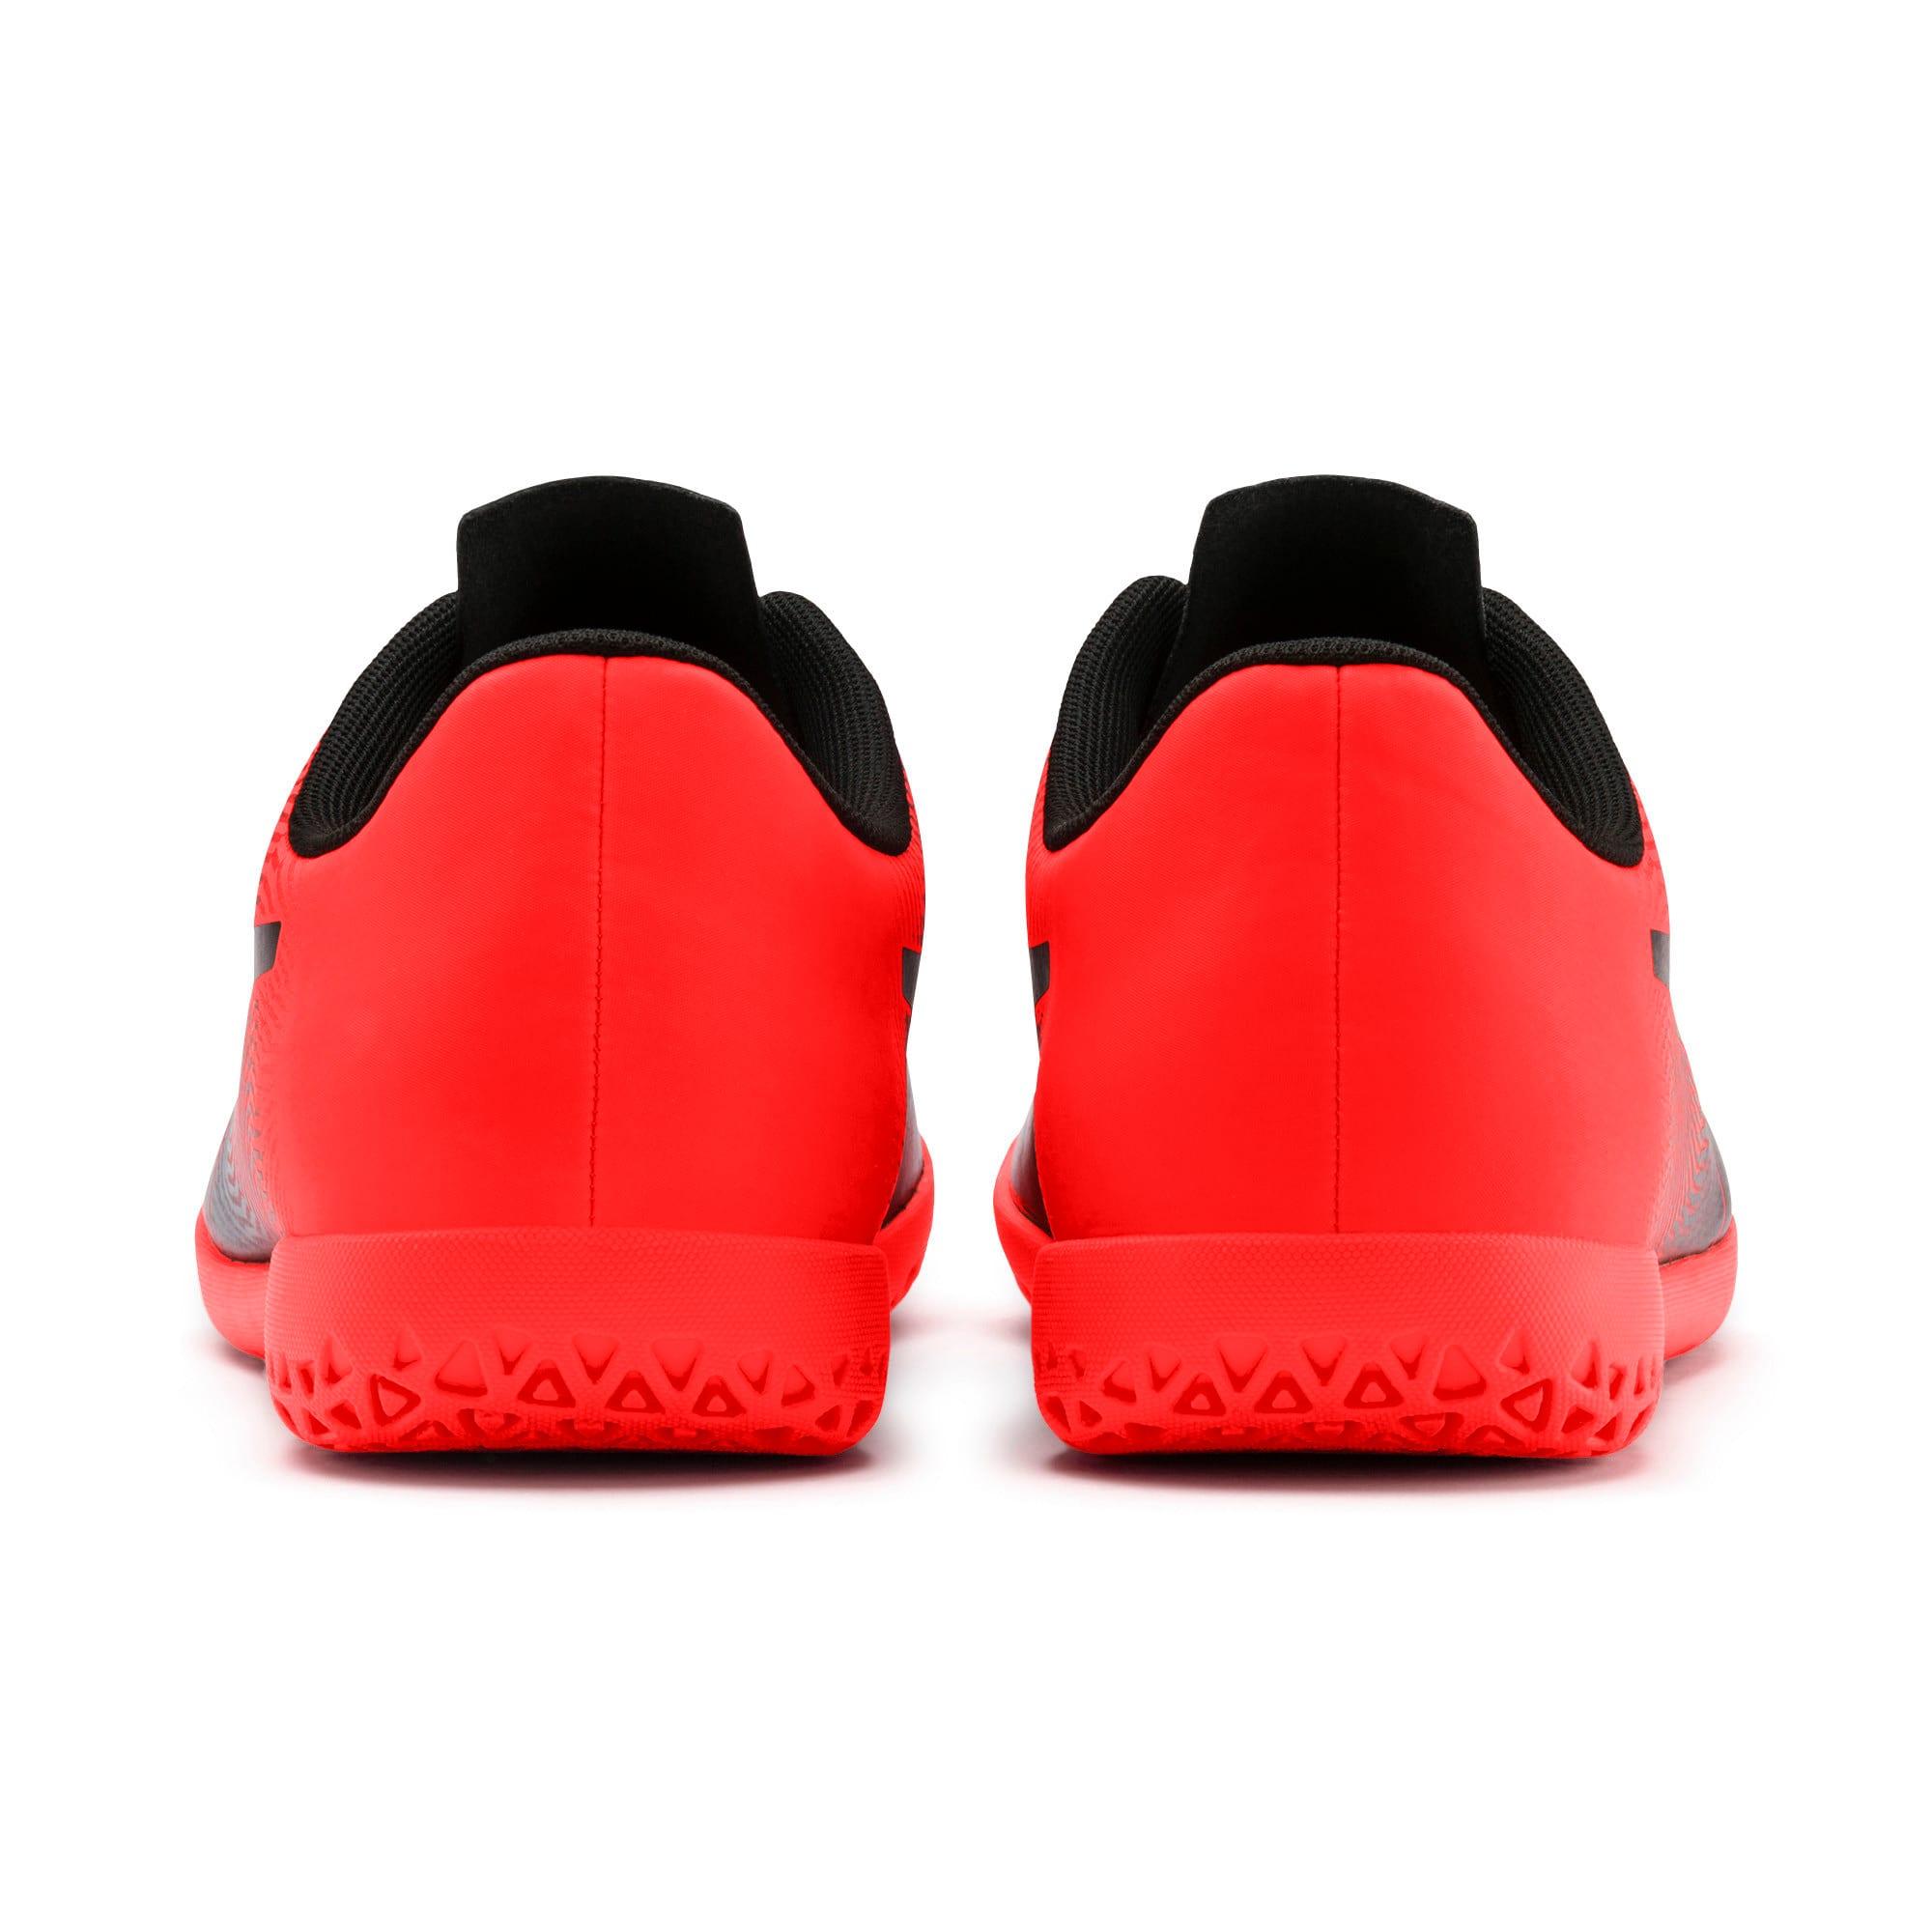 Thumbnail 4 of PUMA Spirit II IT Men's Soccer Shoes, Puma Black-Nrgy Red, medium